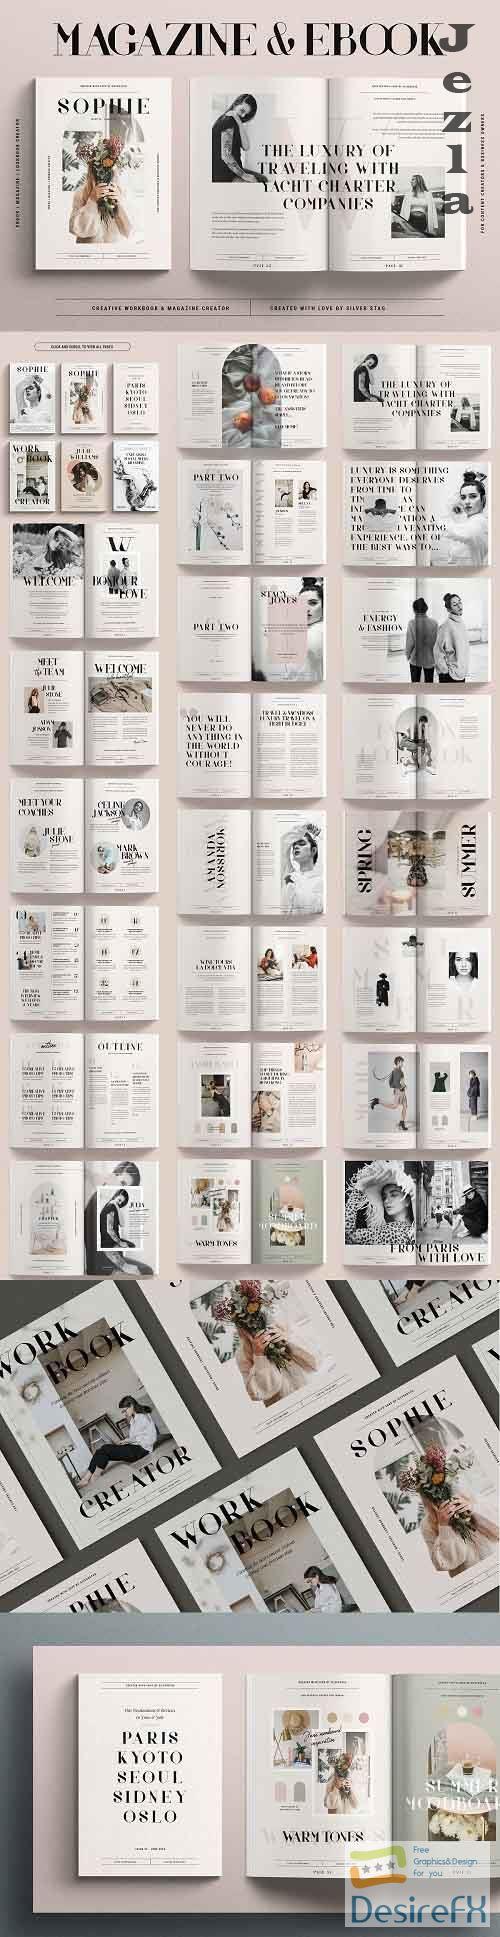 Sophie - eBook & Magazine Creator - 5128857